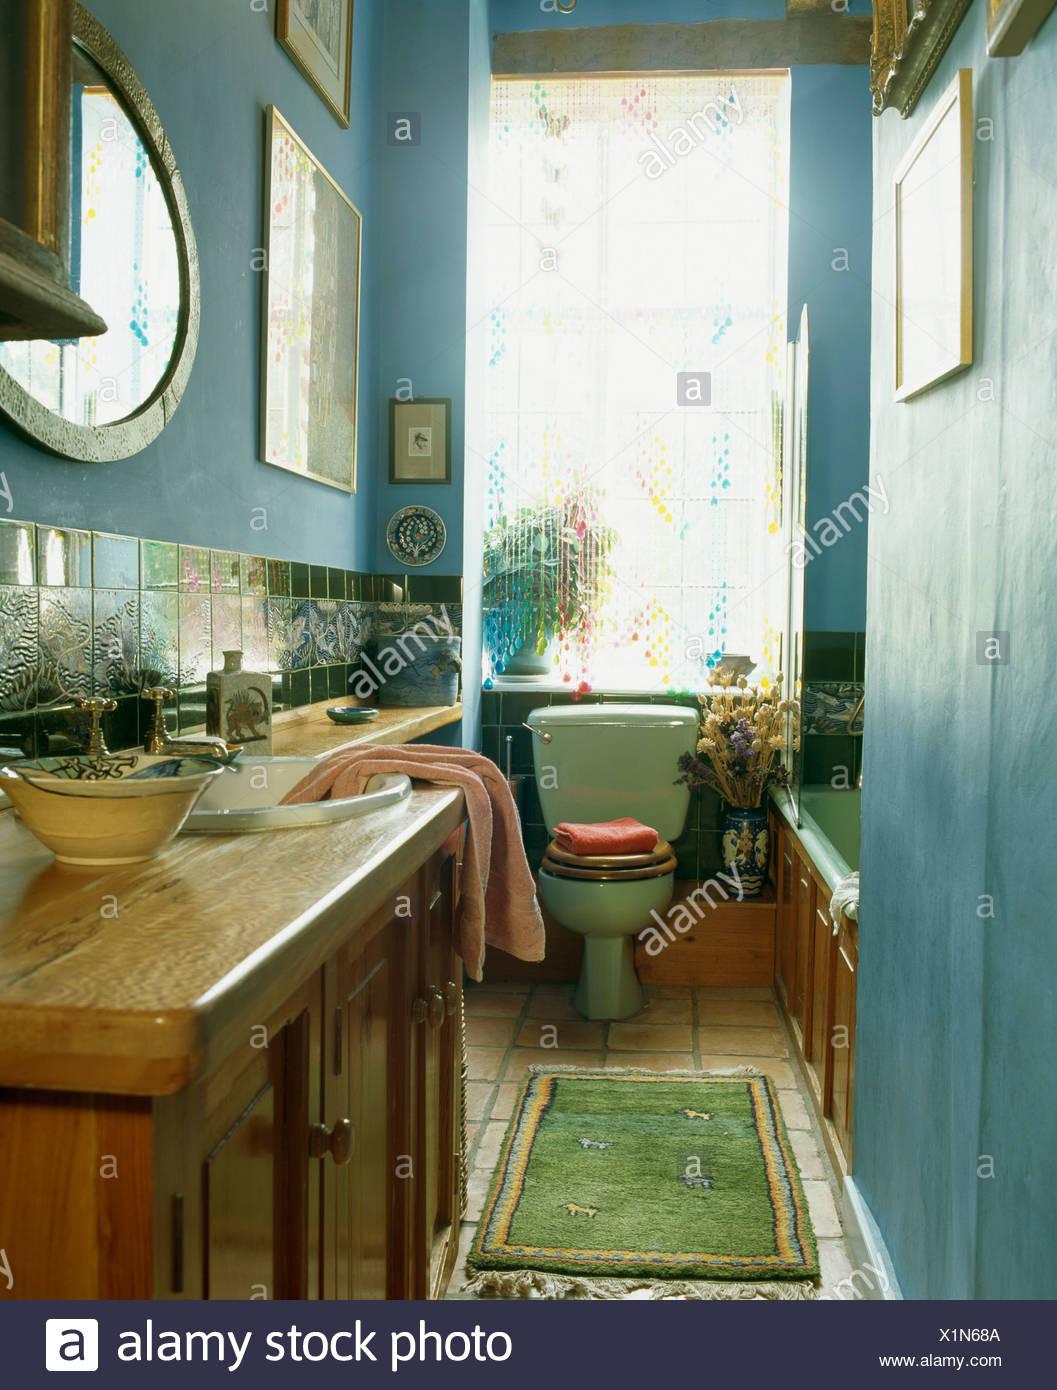 Old pine vanity unit in narrow blue bathroom with green rug ... Narrow Bathroom Design Tile Rug on mexican tile design rug, kitchen tile rug, ceramic tile rug, faucet design rug,